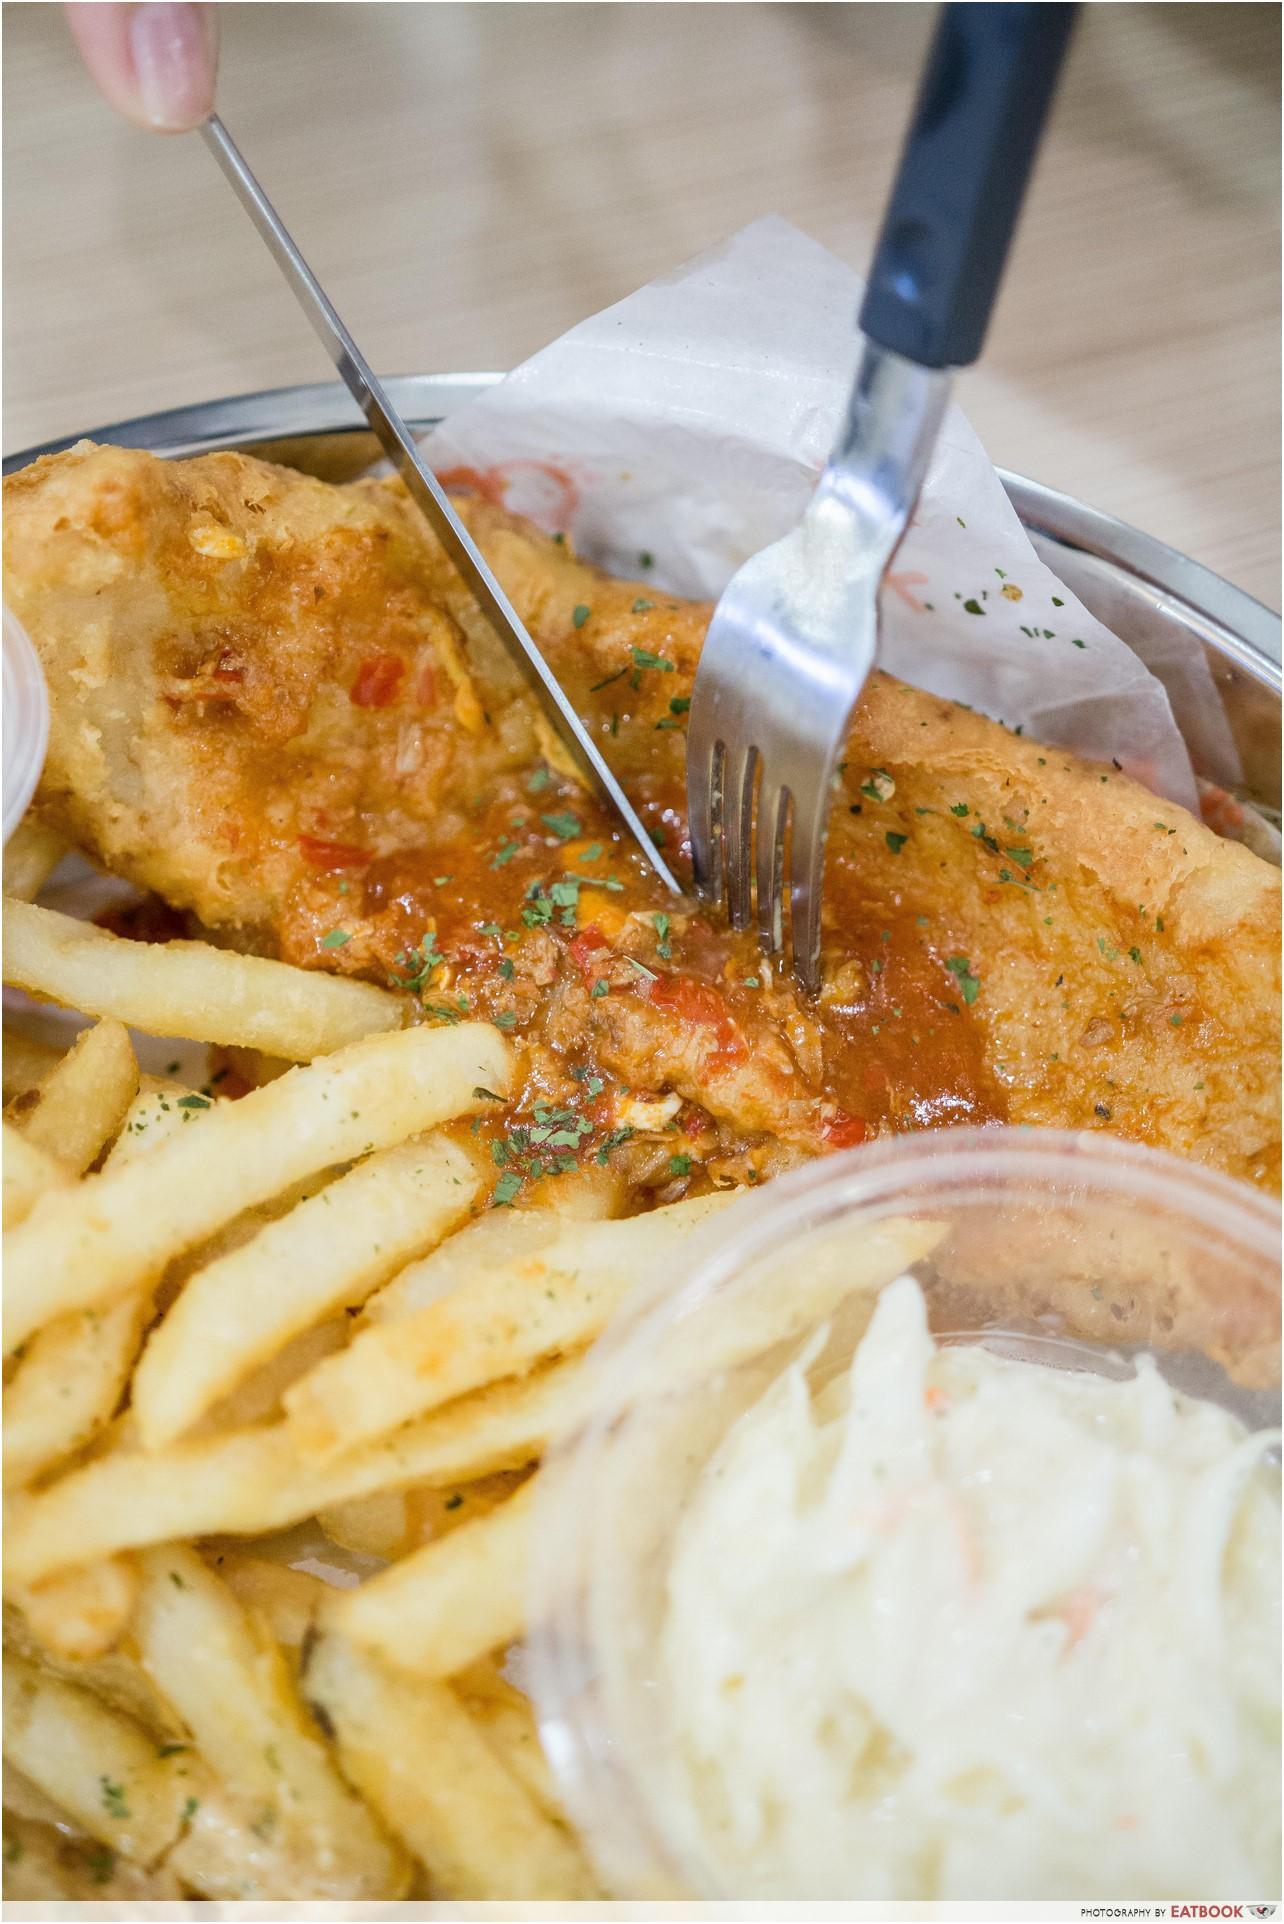 cheap halal food - Fish and Chicks chilli crab sauce